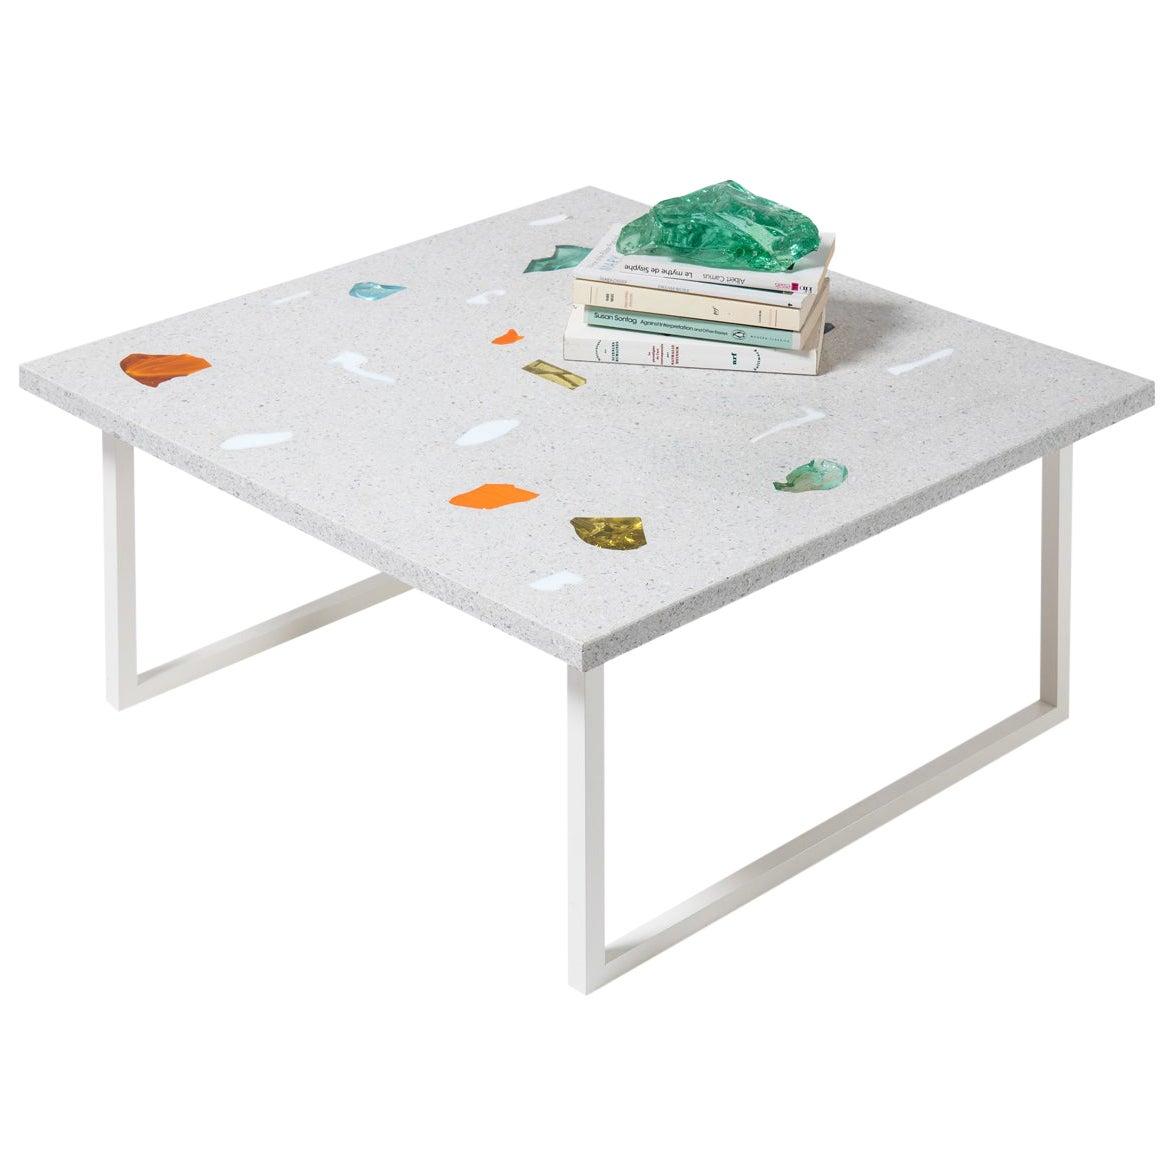 Contemporary Customizable Square Basis Rho Neoterrazzo Coffee Table